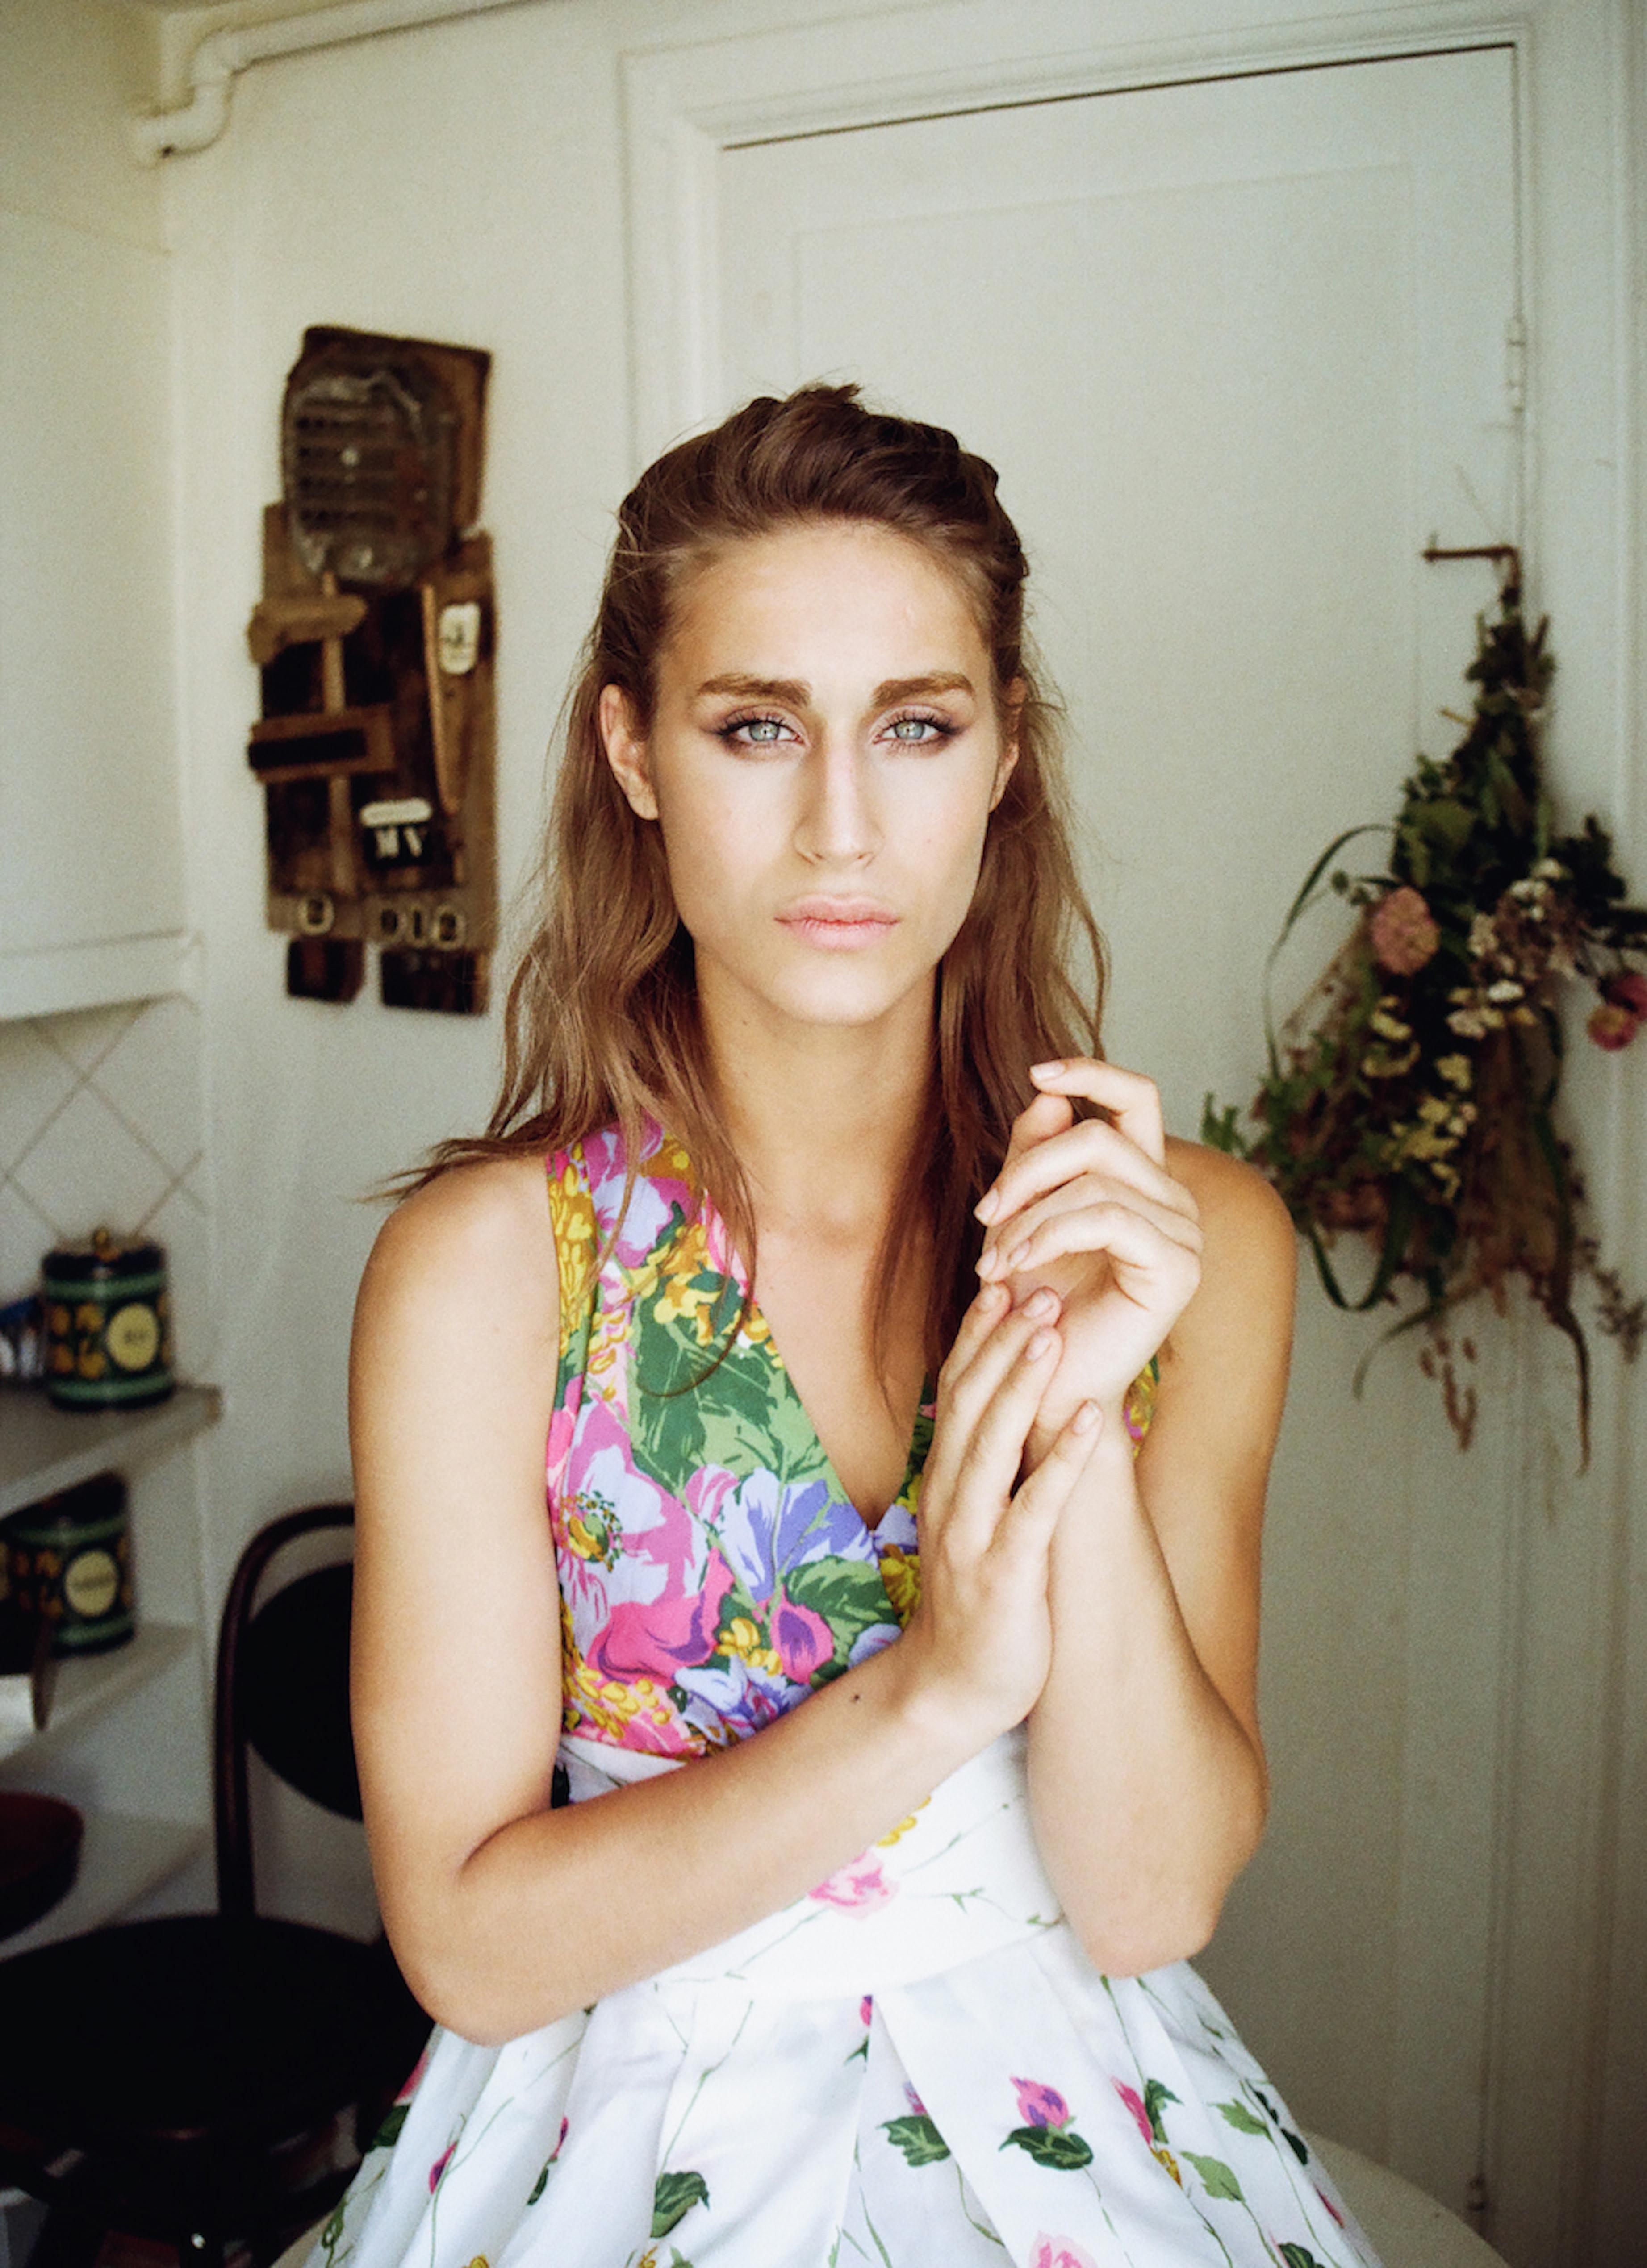 May Lifschitz, 20, Copenhagen, model, make-up artist, art history student, DJ and actor